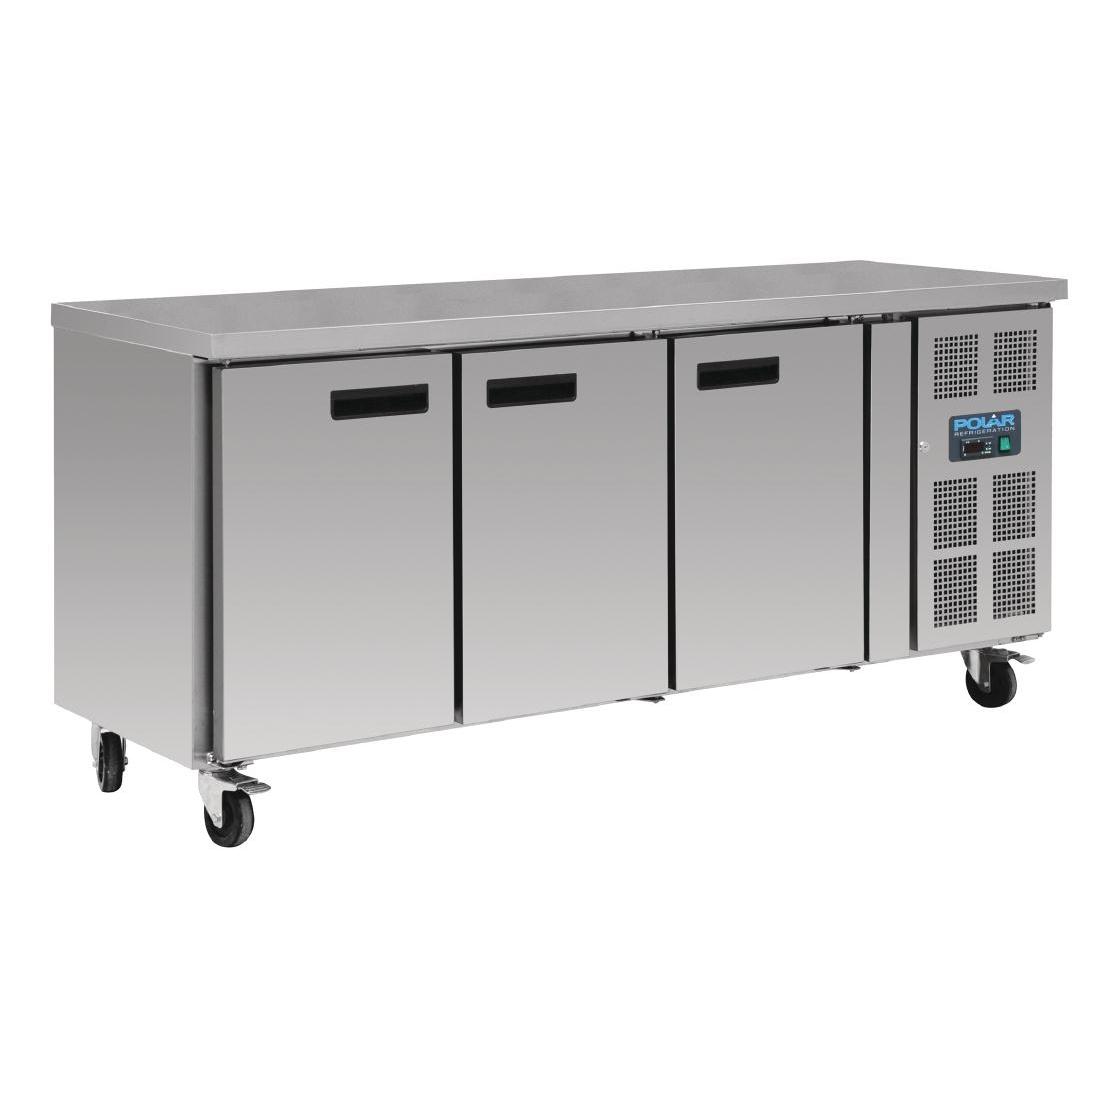 Table réfrigérée négative 417L